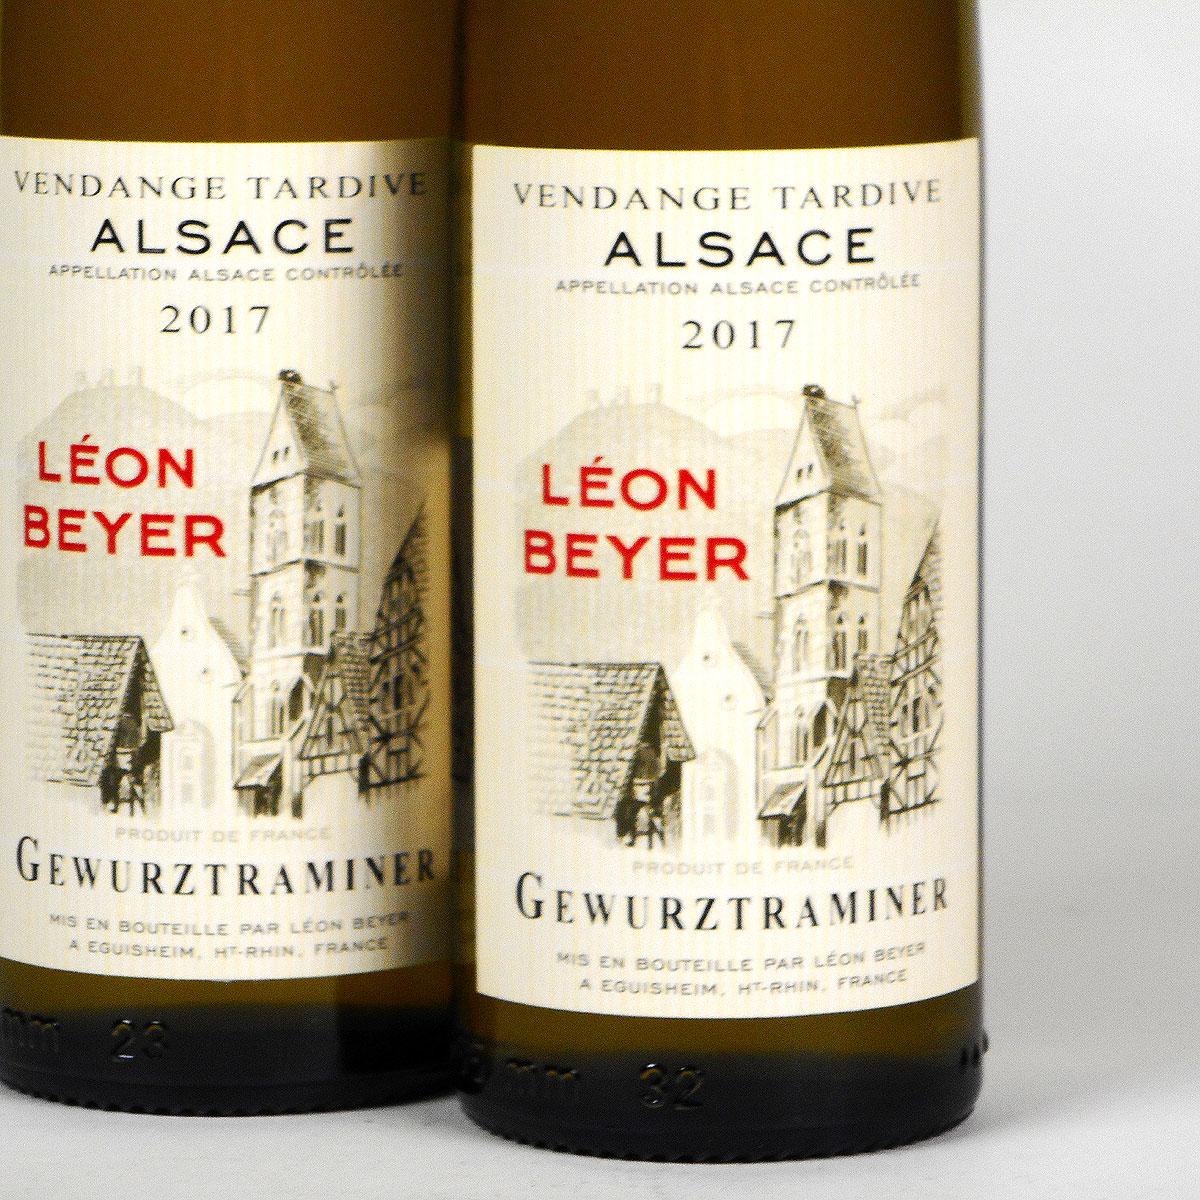 Alsace: Léon Beyer 'Vendange Tardive' Gewürztraminer 2017